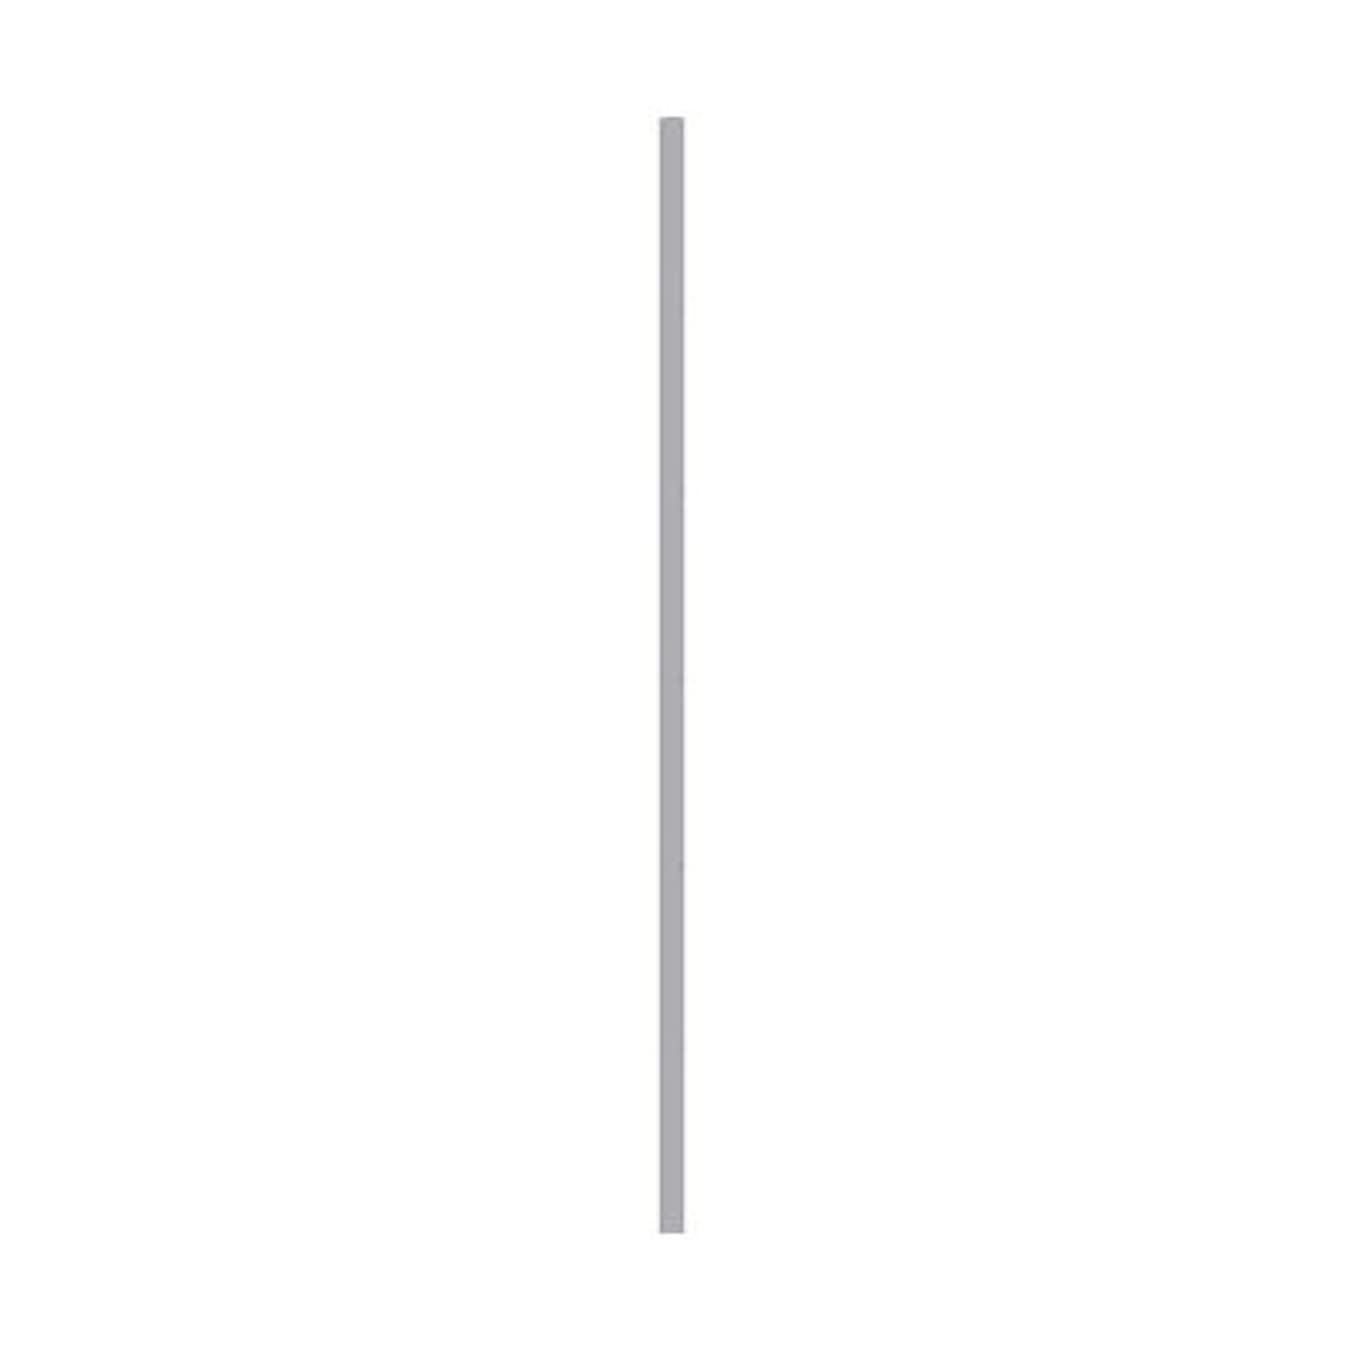 Kichler 2999NI Accessory Stem 0.5 x 12-Inch, Brushed Nickel